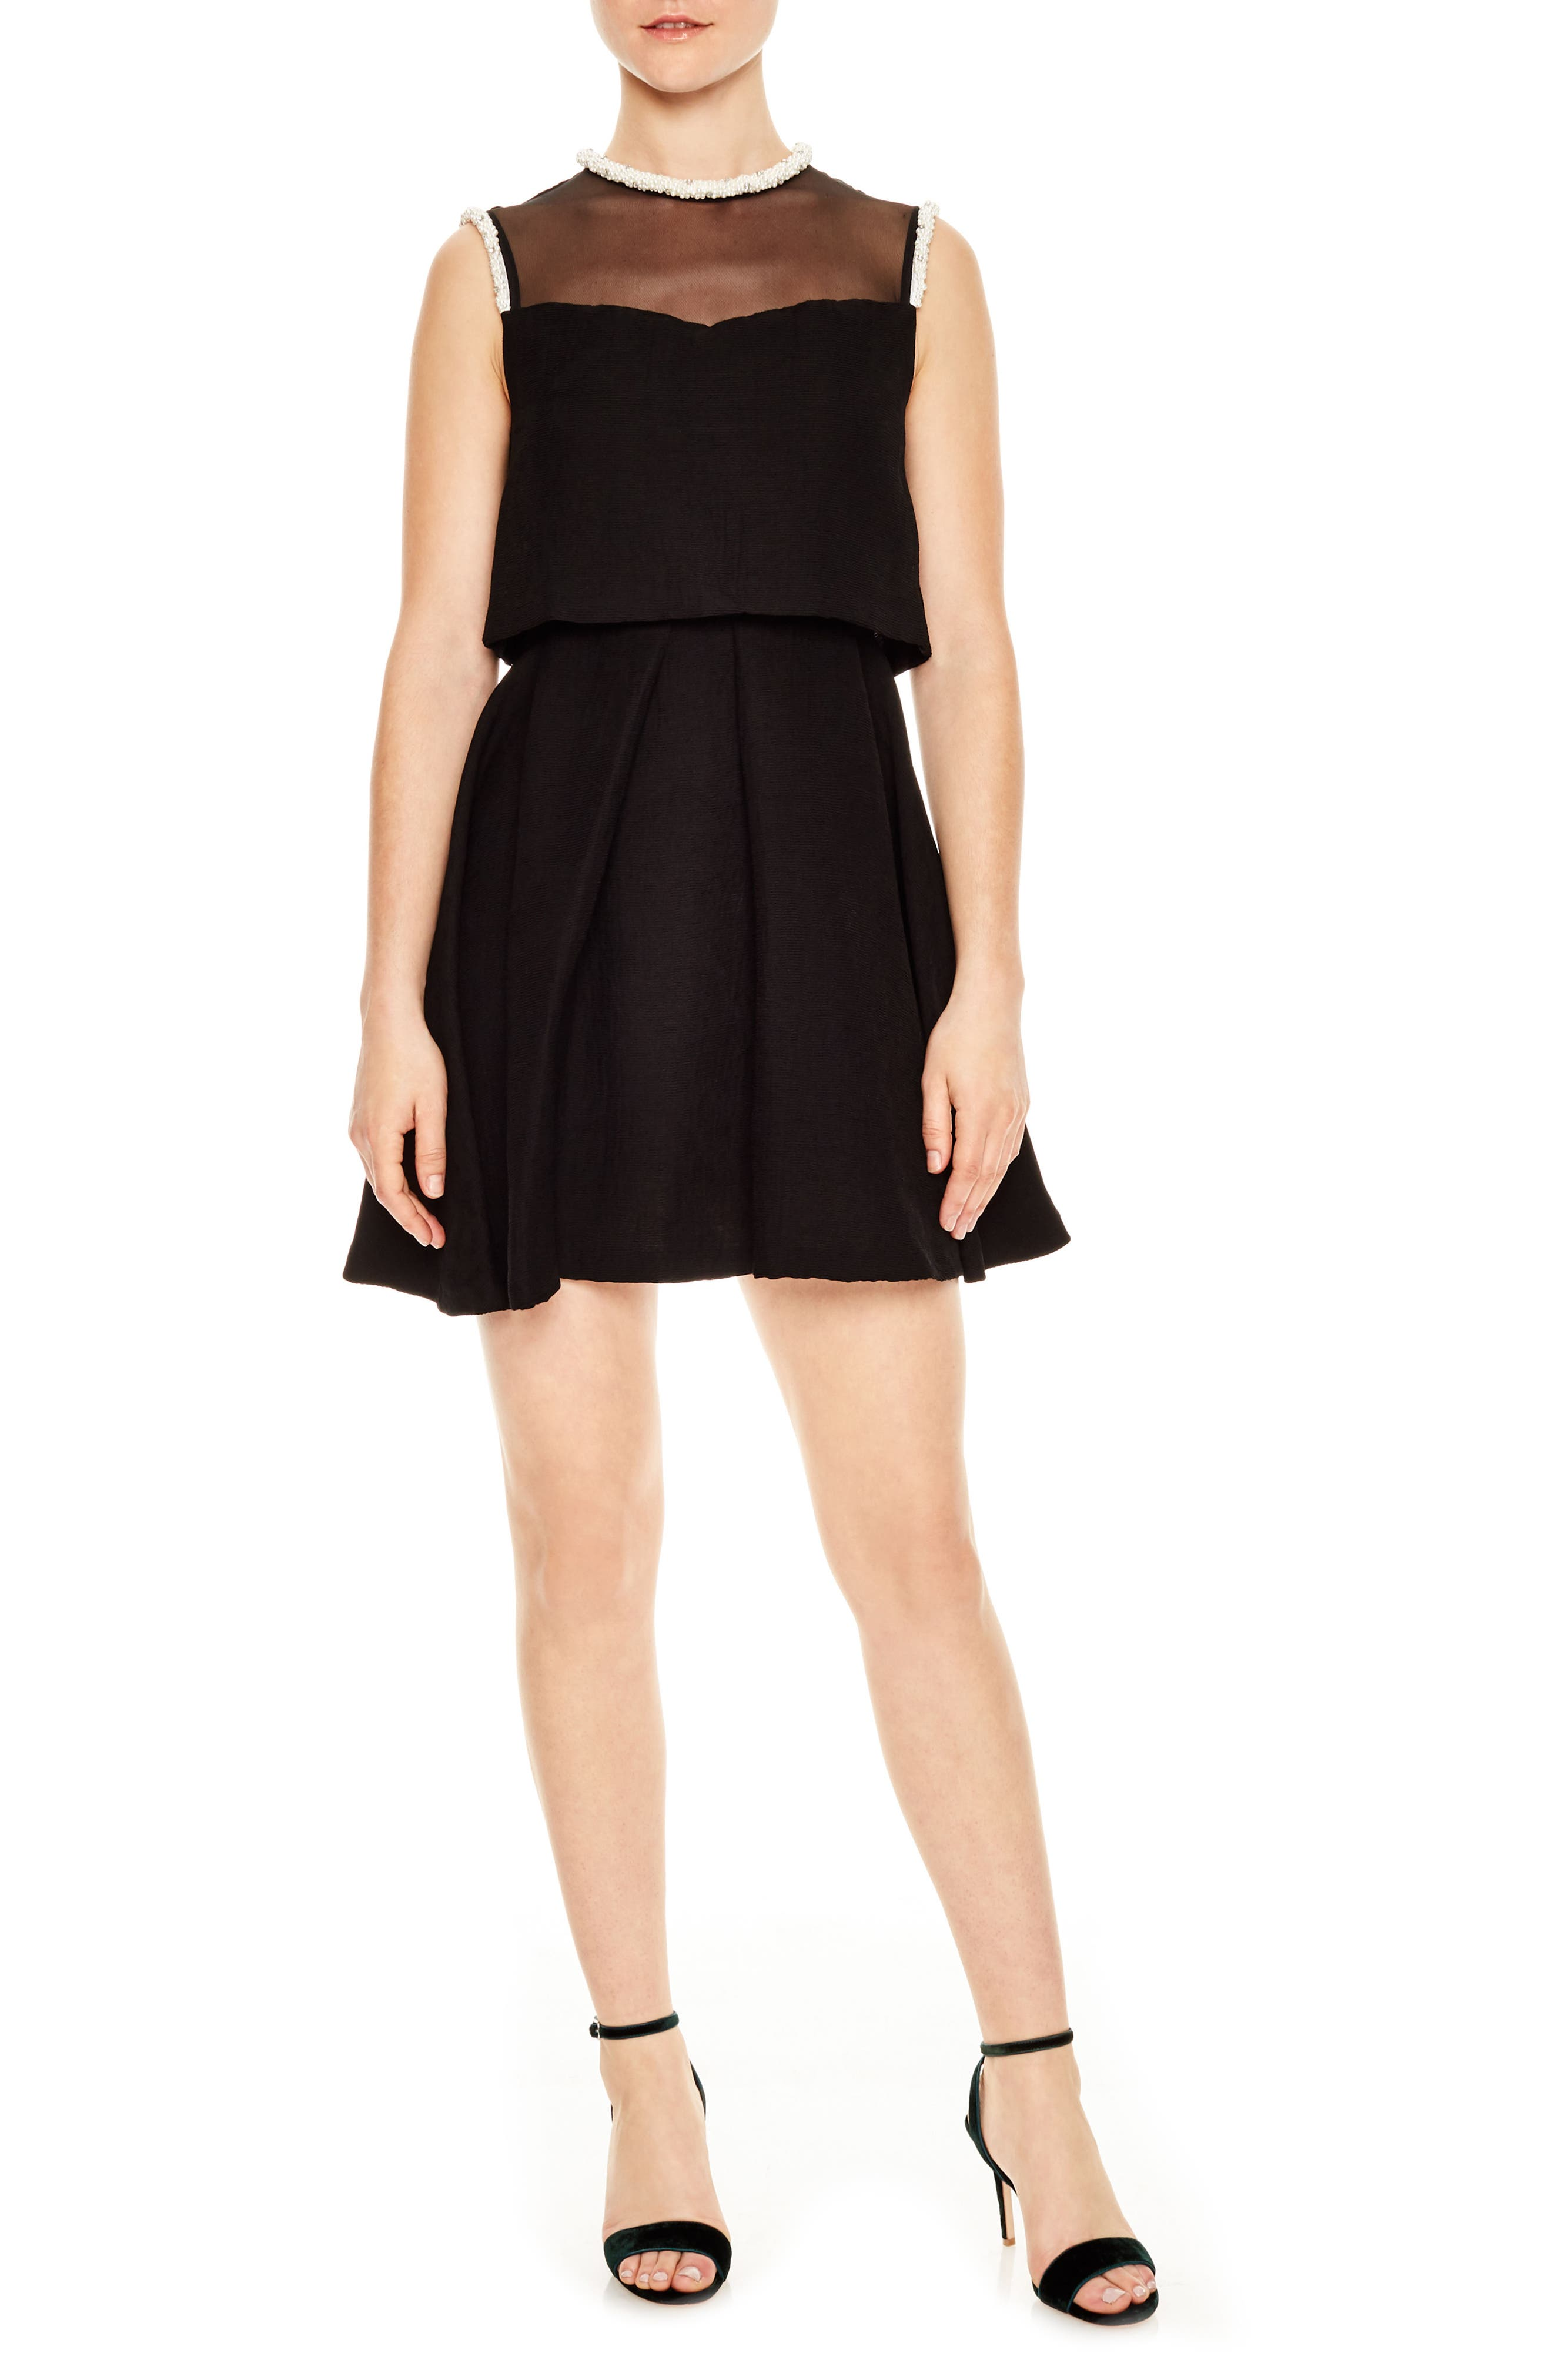 Ouma Jewel Neck Flare Dress,                             Main thumbnail 1, color,                             Black